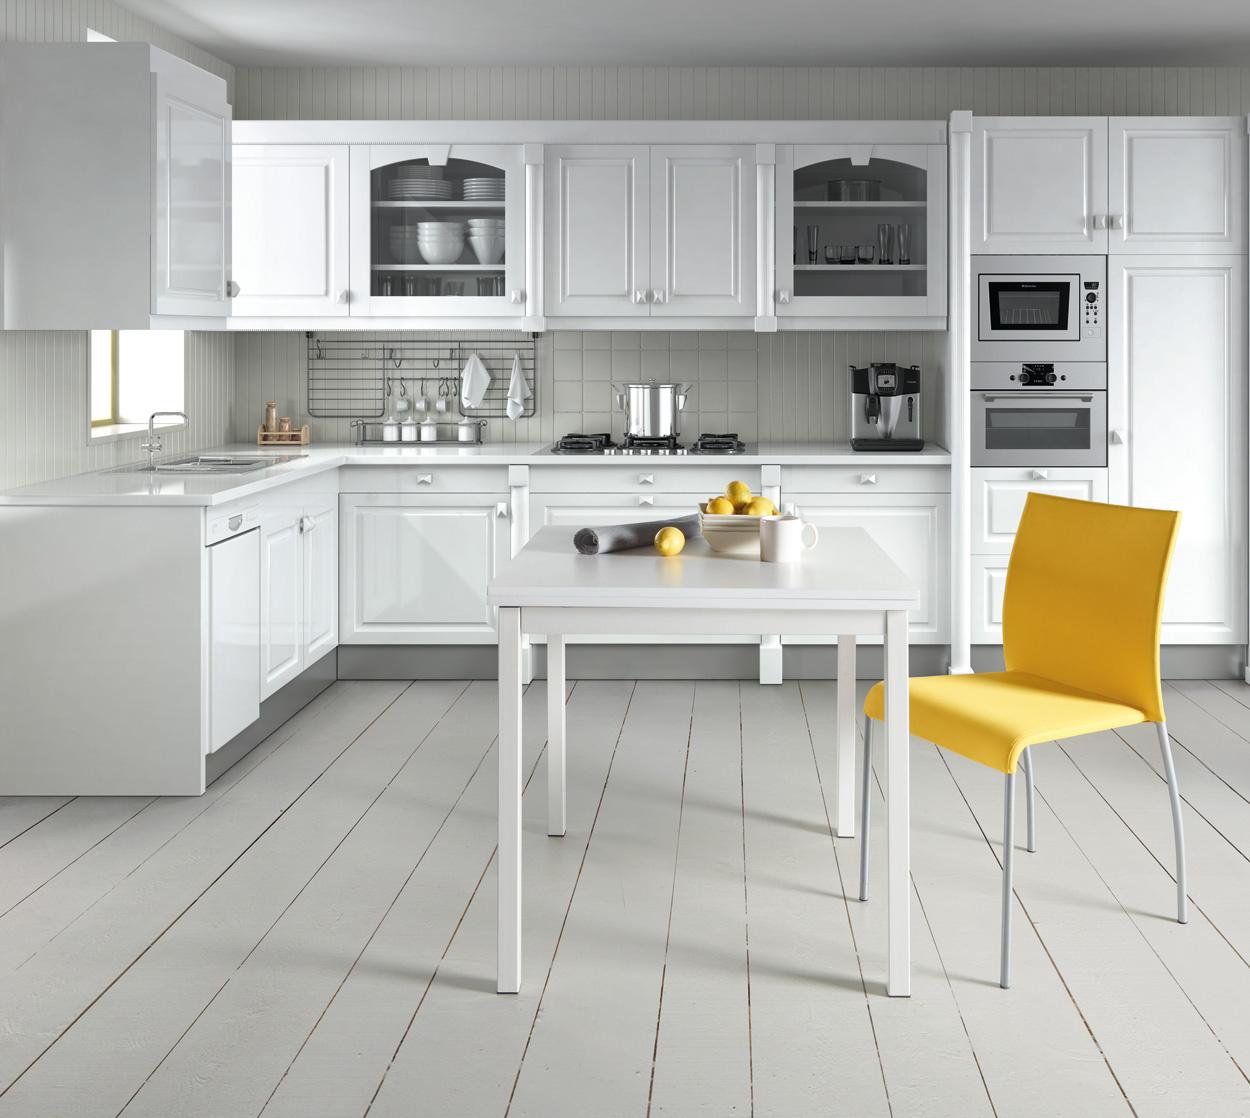 Mesa Cocina Cuadrada - Diseños Arquitectónicos - Mimasku.com